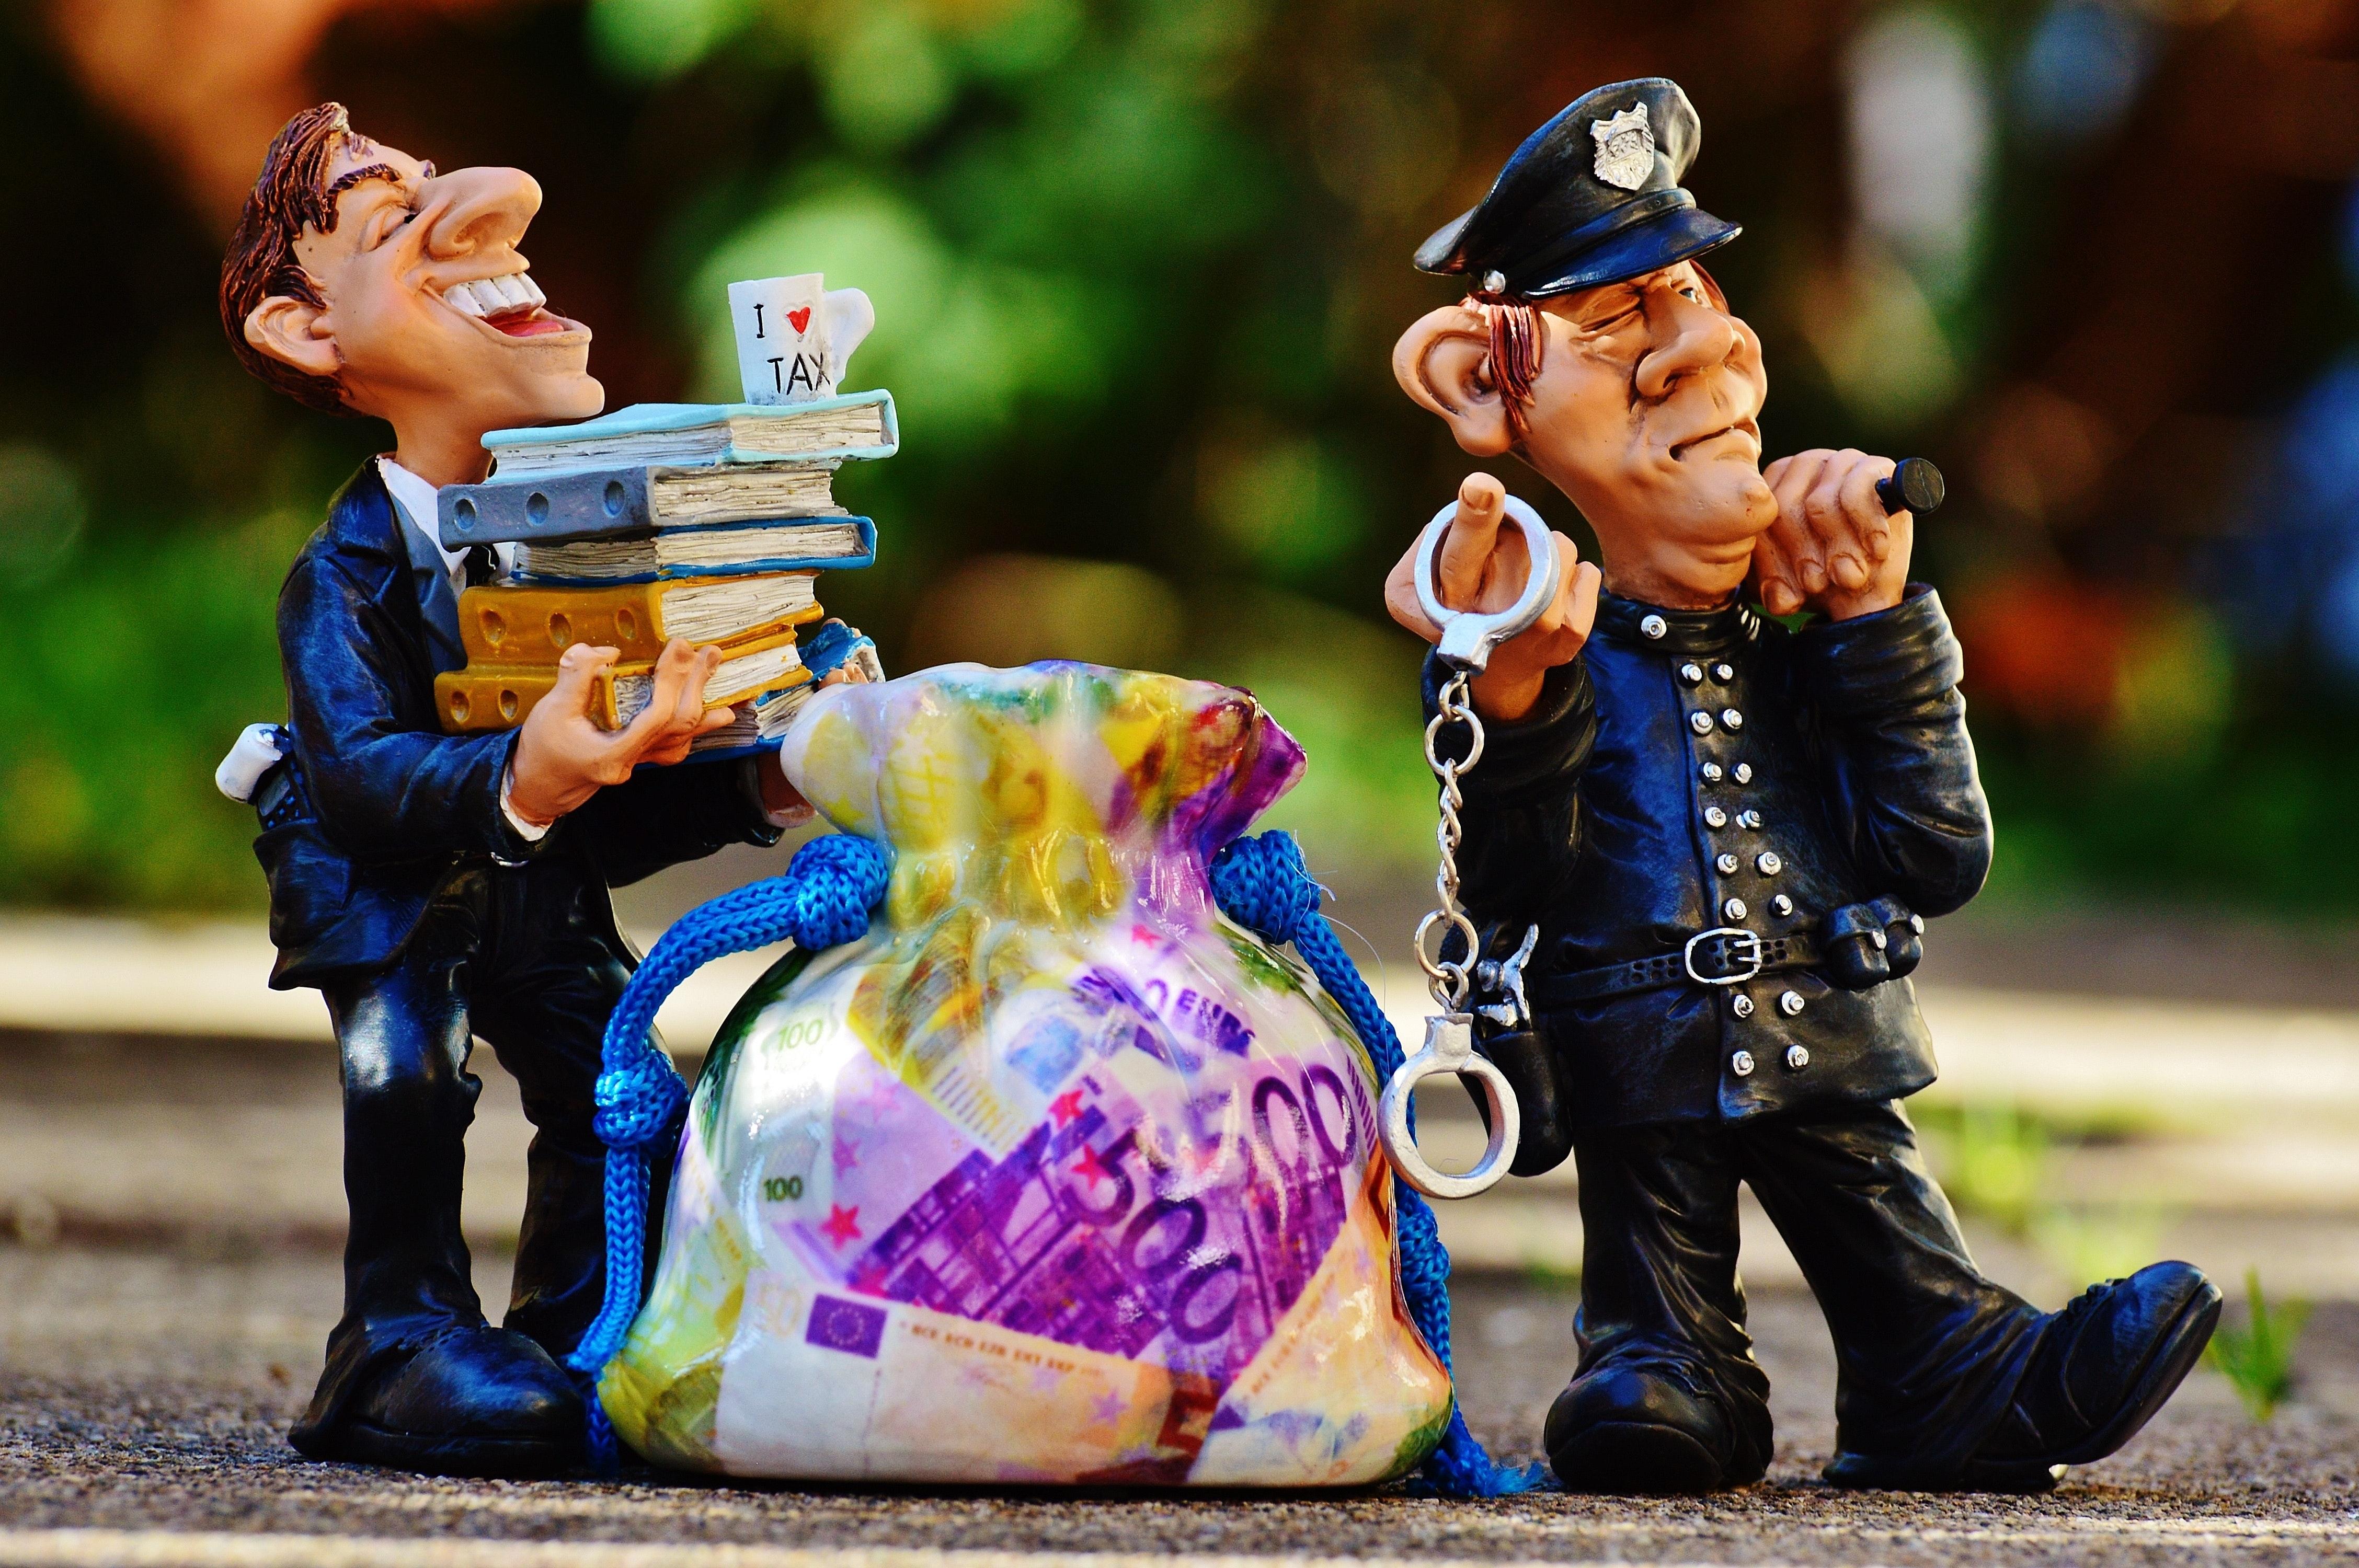 billing-bureaucracy-cop-33596